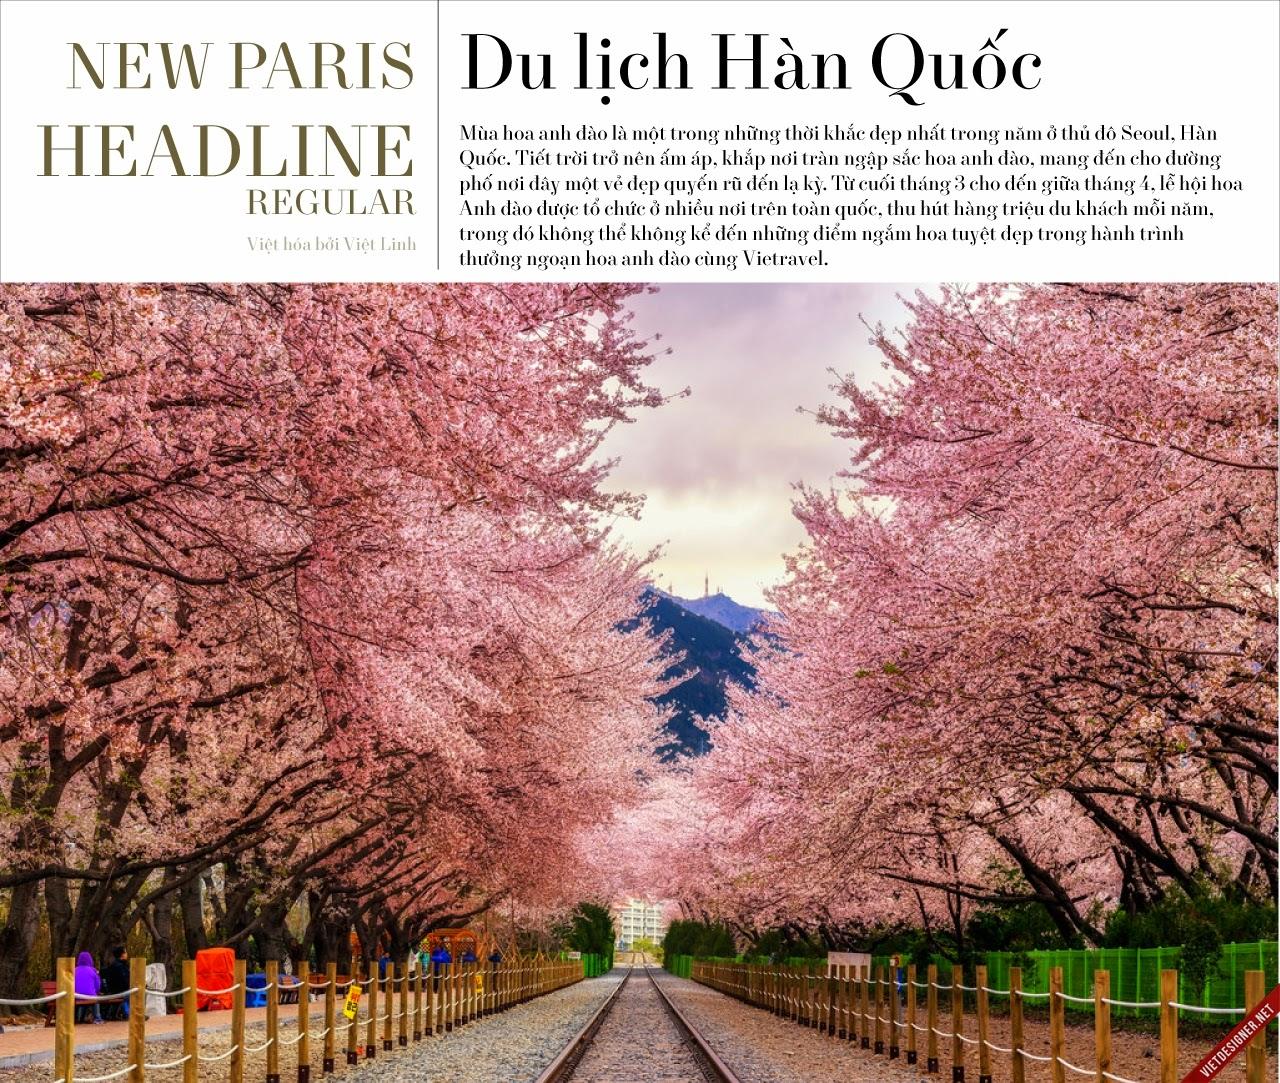 [Serif] NewParis Headline Regular Việt hóa